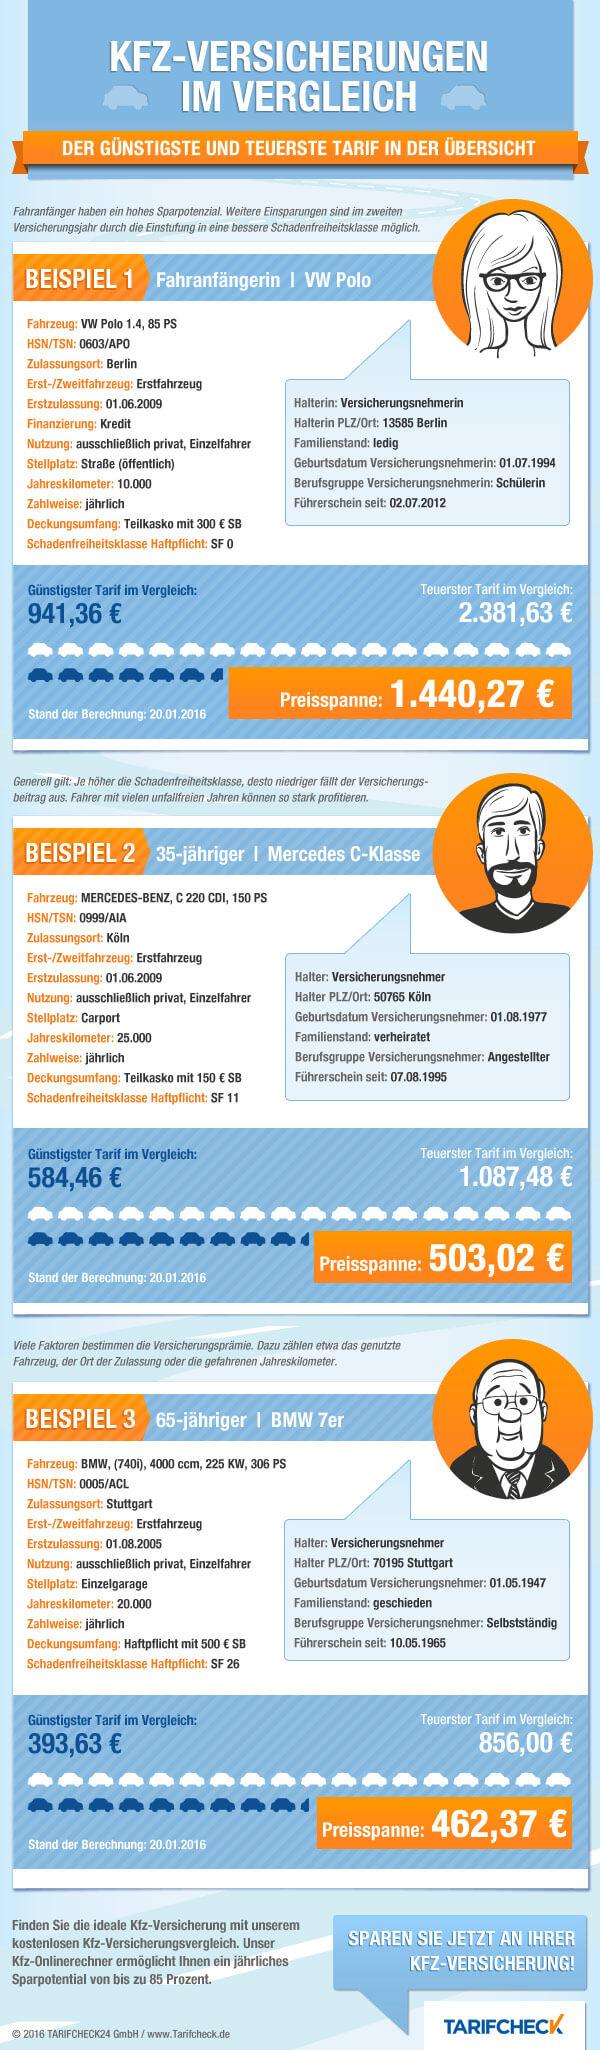 Kfz Versicherung Vergleich 012020: Bis zu 850 € sparen an